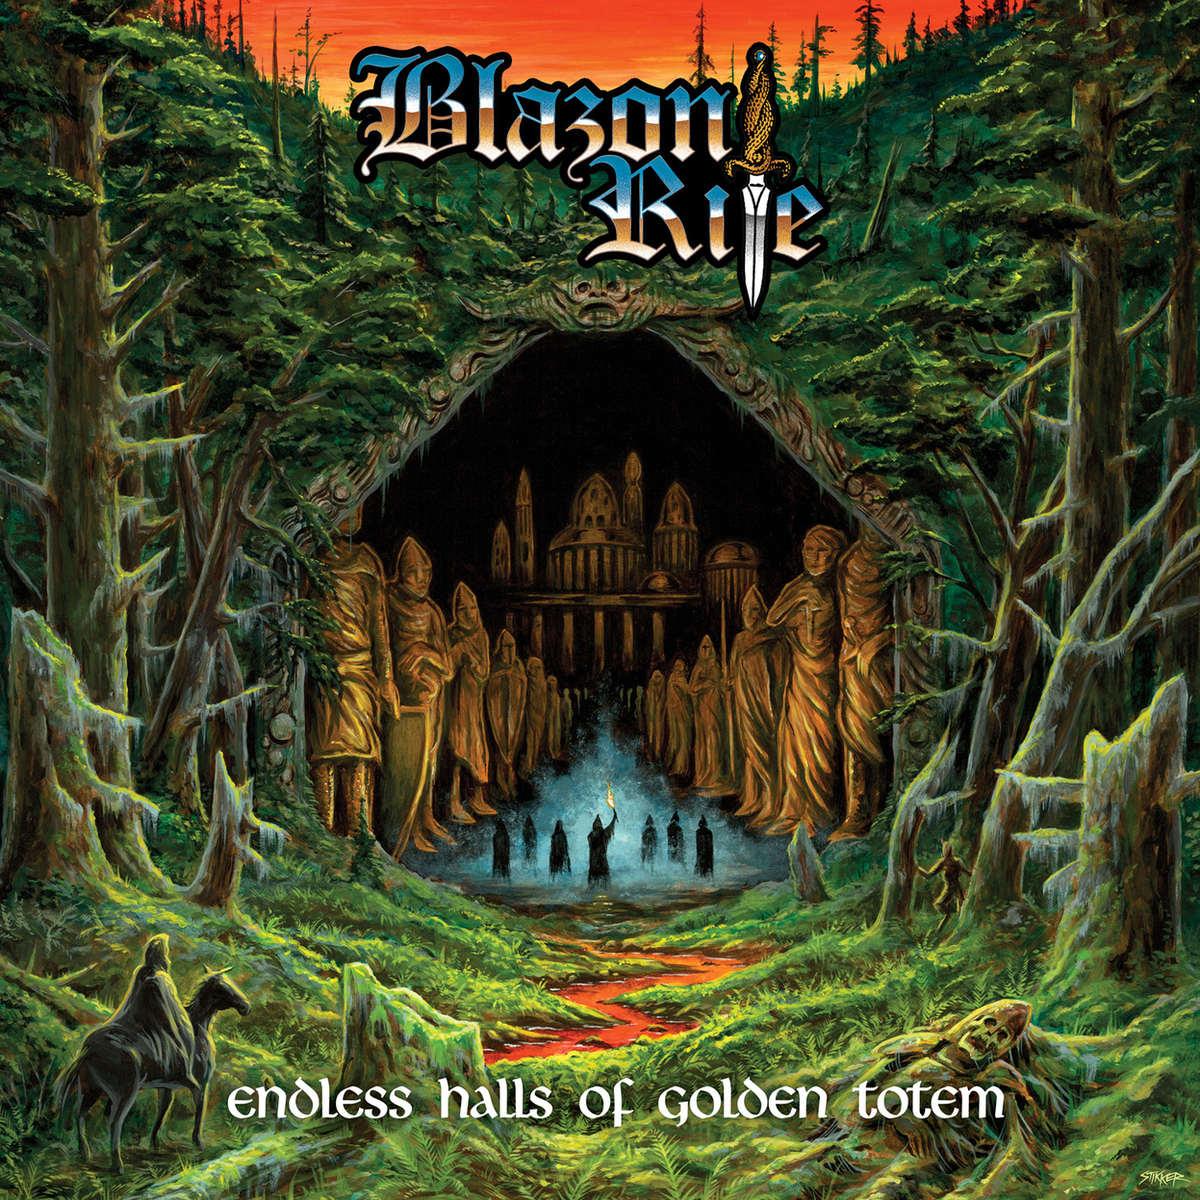 Blazon-Rite-Endless-Halls-Of-Golden-Totem-Cover.jpg